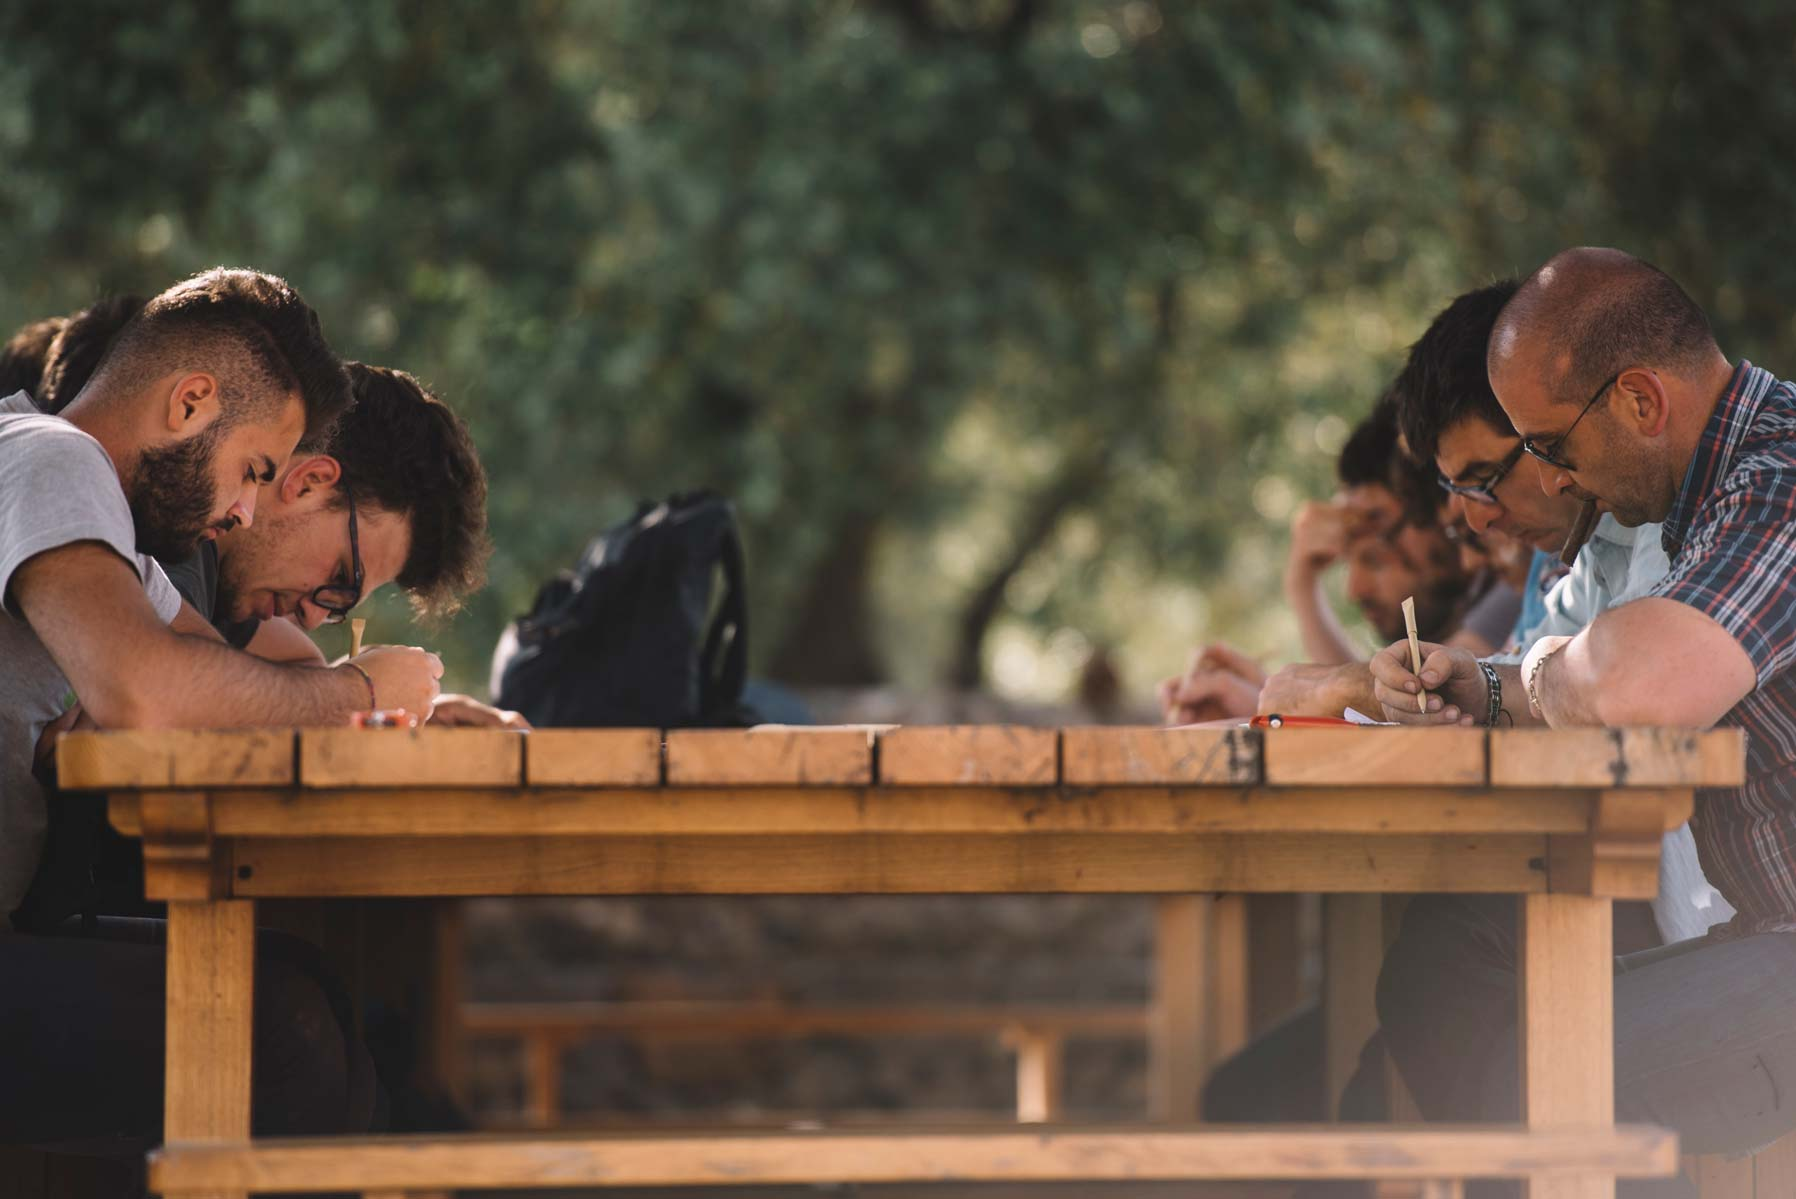 évaluation | Planeta | Passopisciaro | Etna | Sicilia | Italy